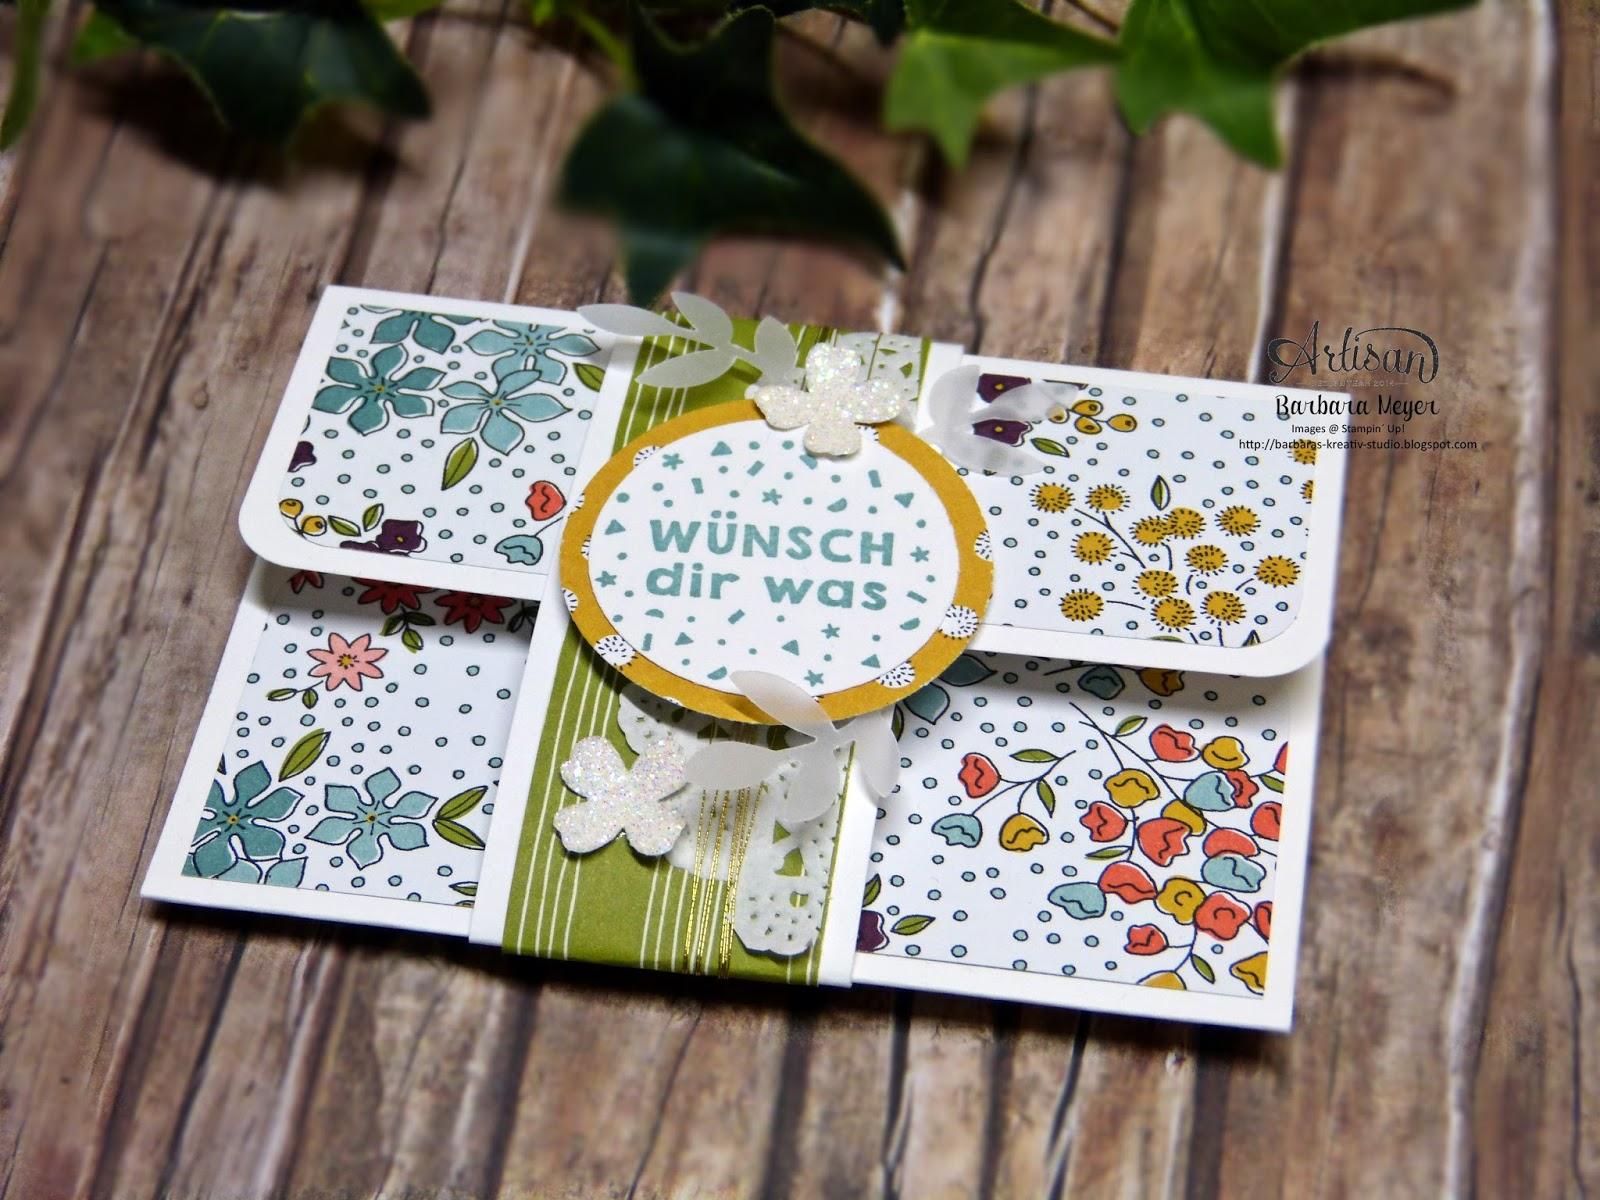 ... StampinUp! Demonstratorin in Wien : Geldgeschenke hübsch verpackt